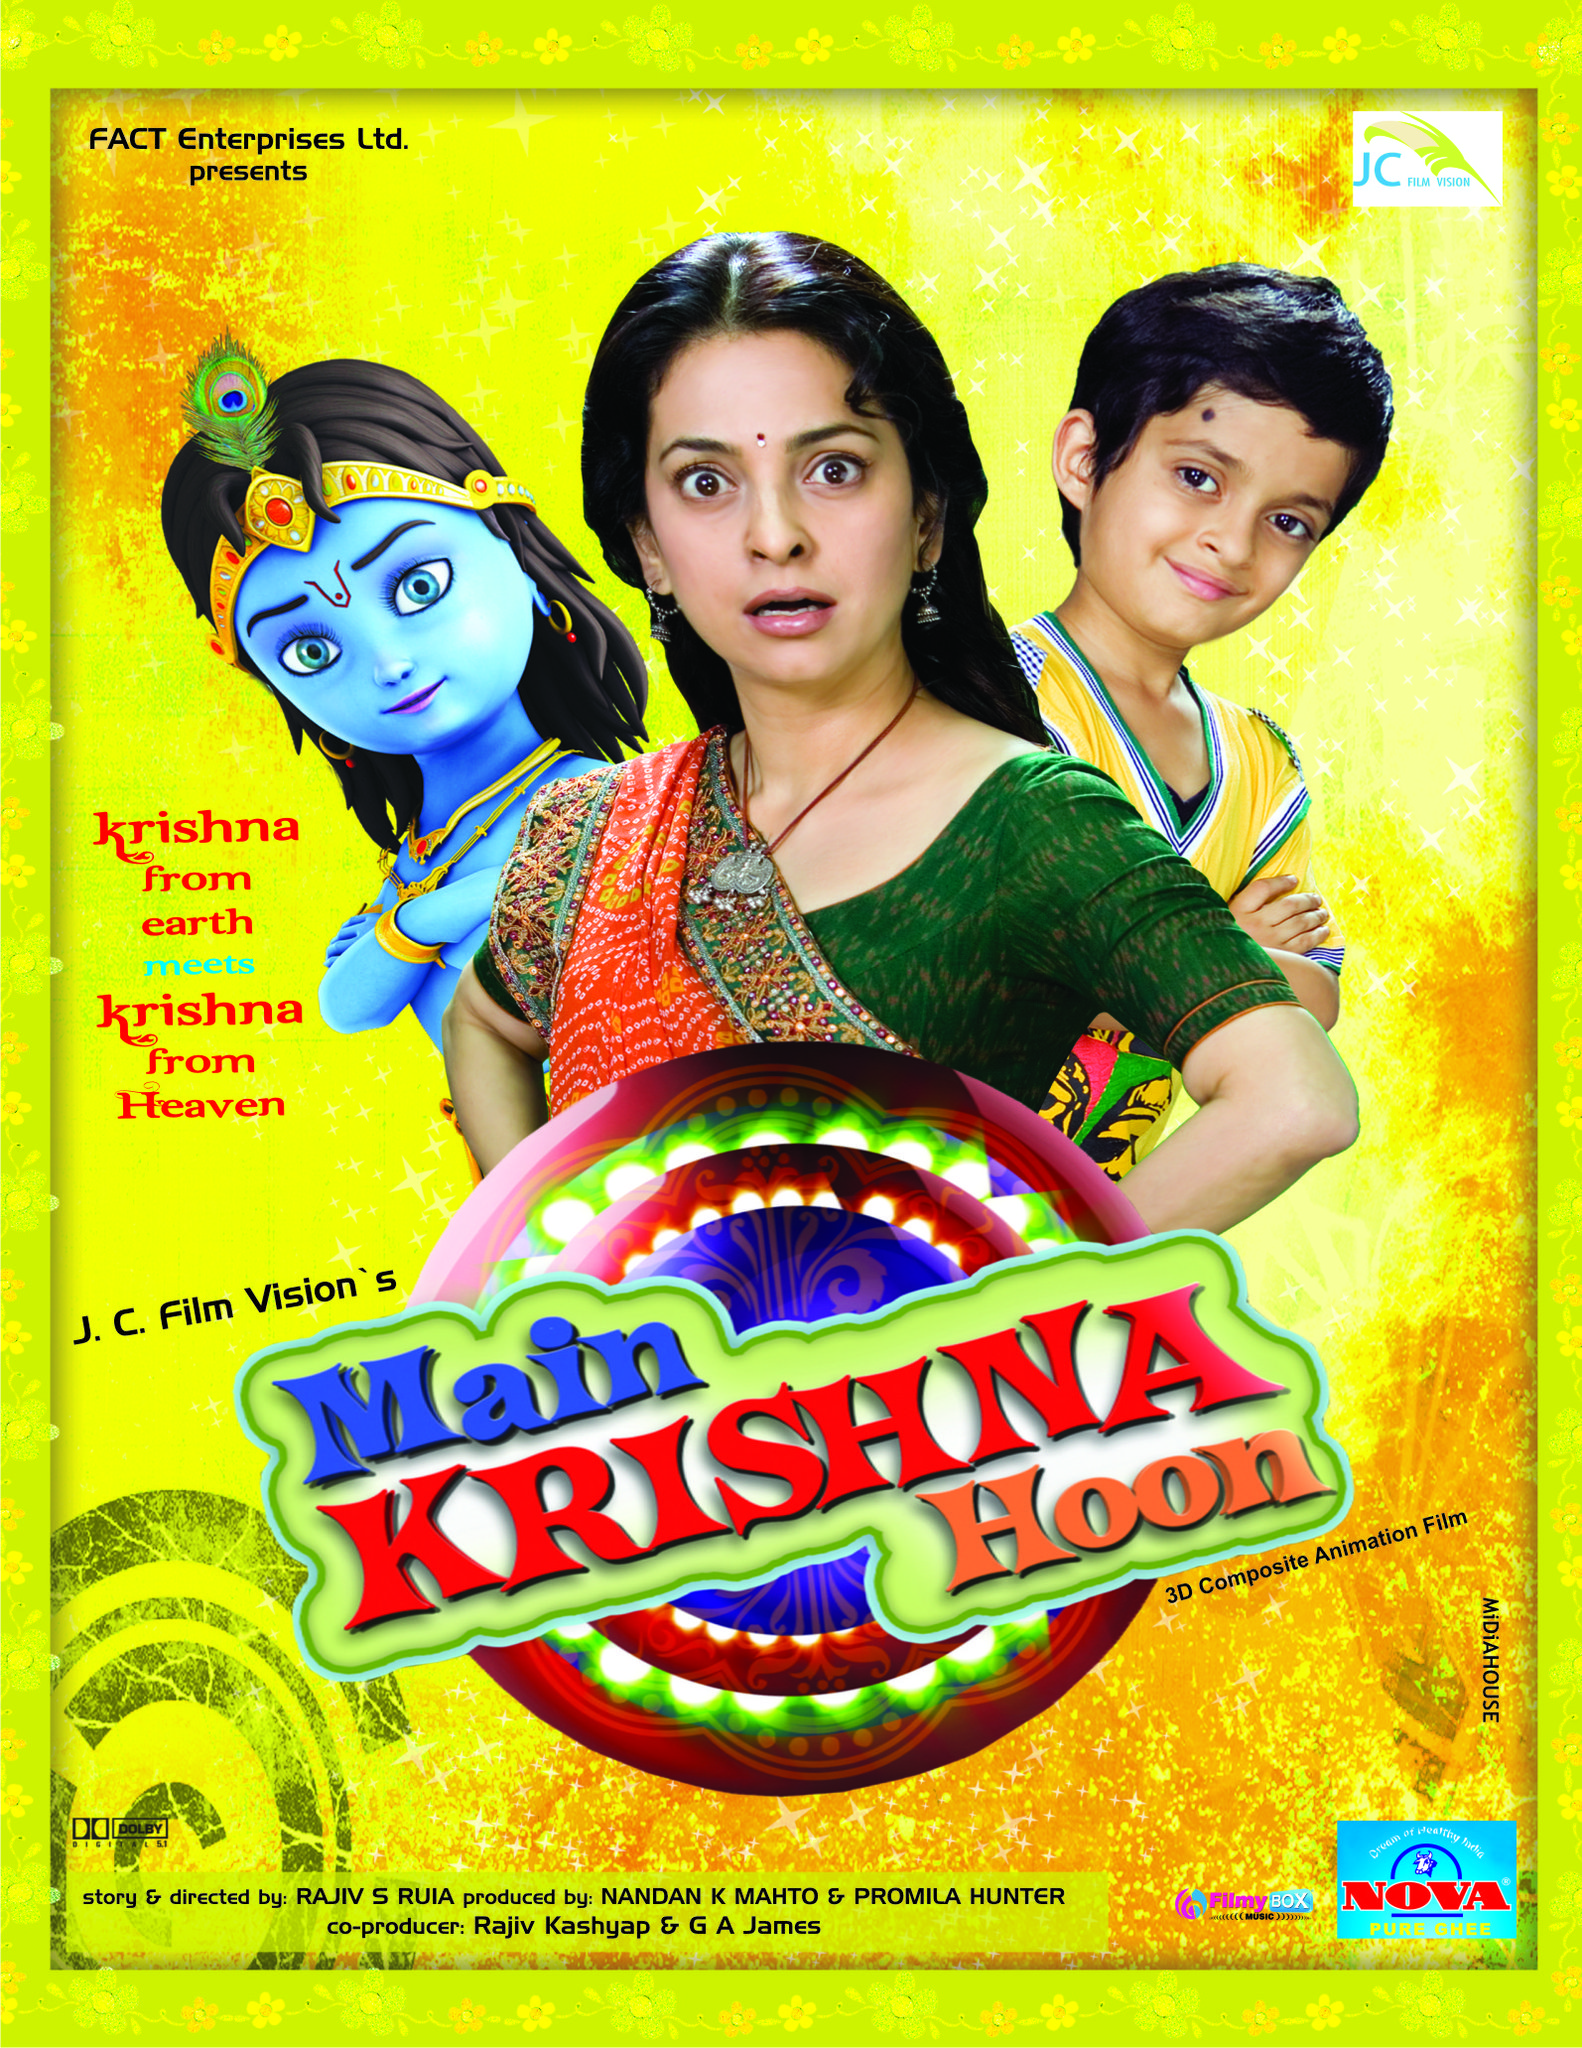 Main Krishna Hoon - Movie Poster #2 (Original)